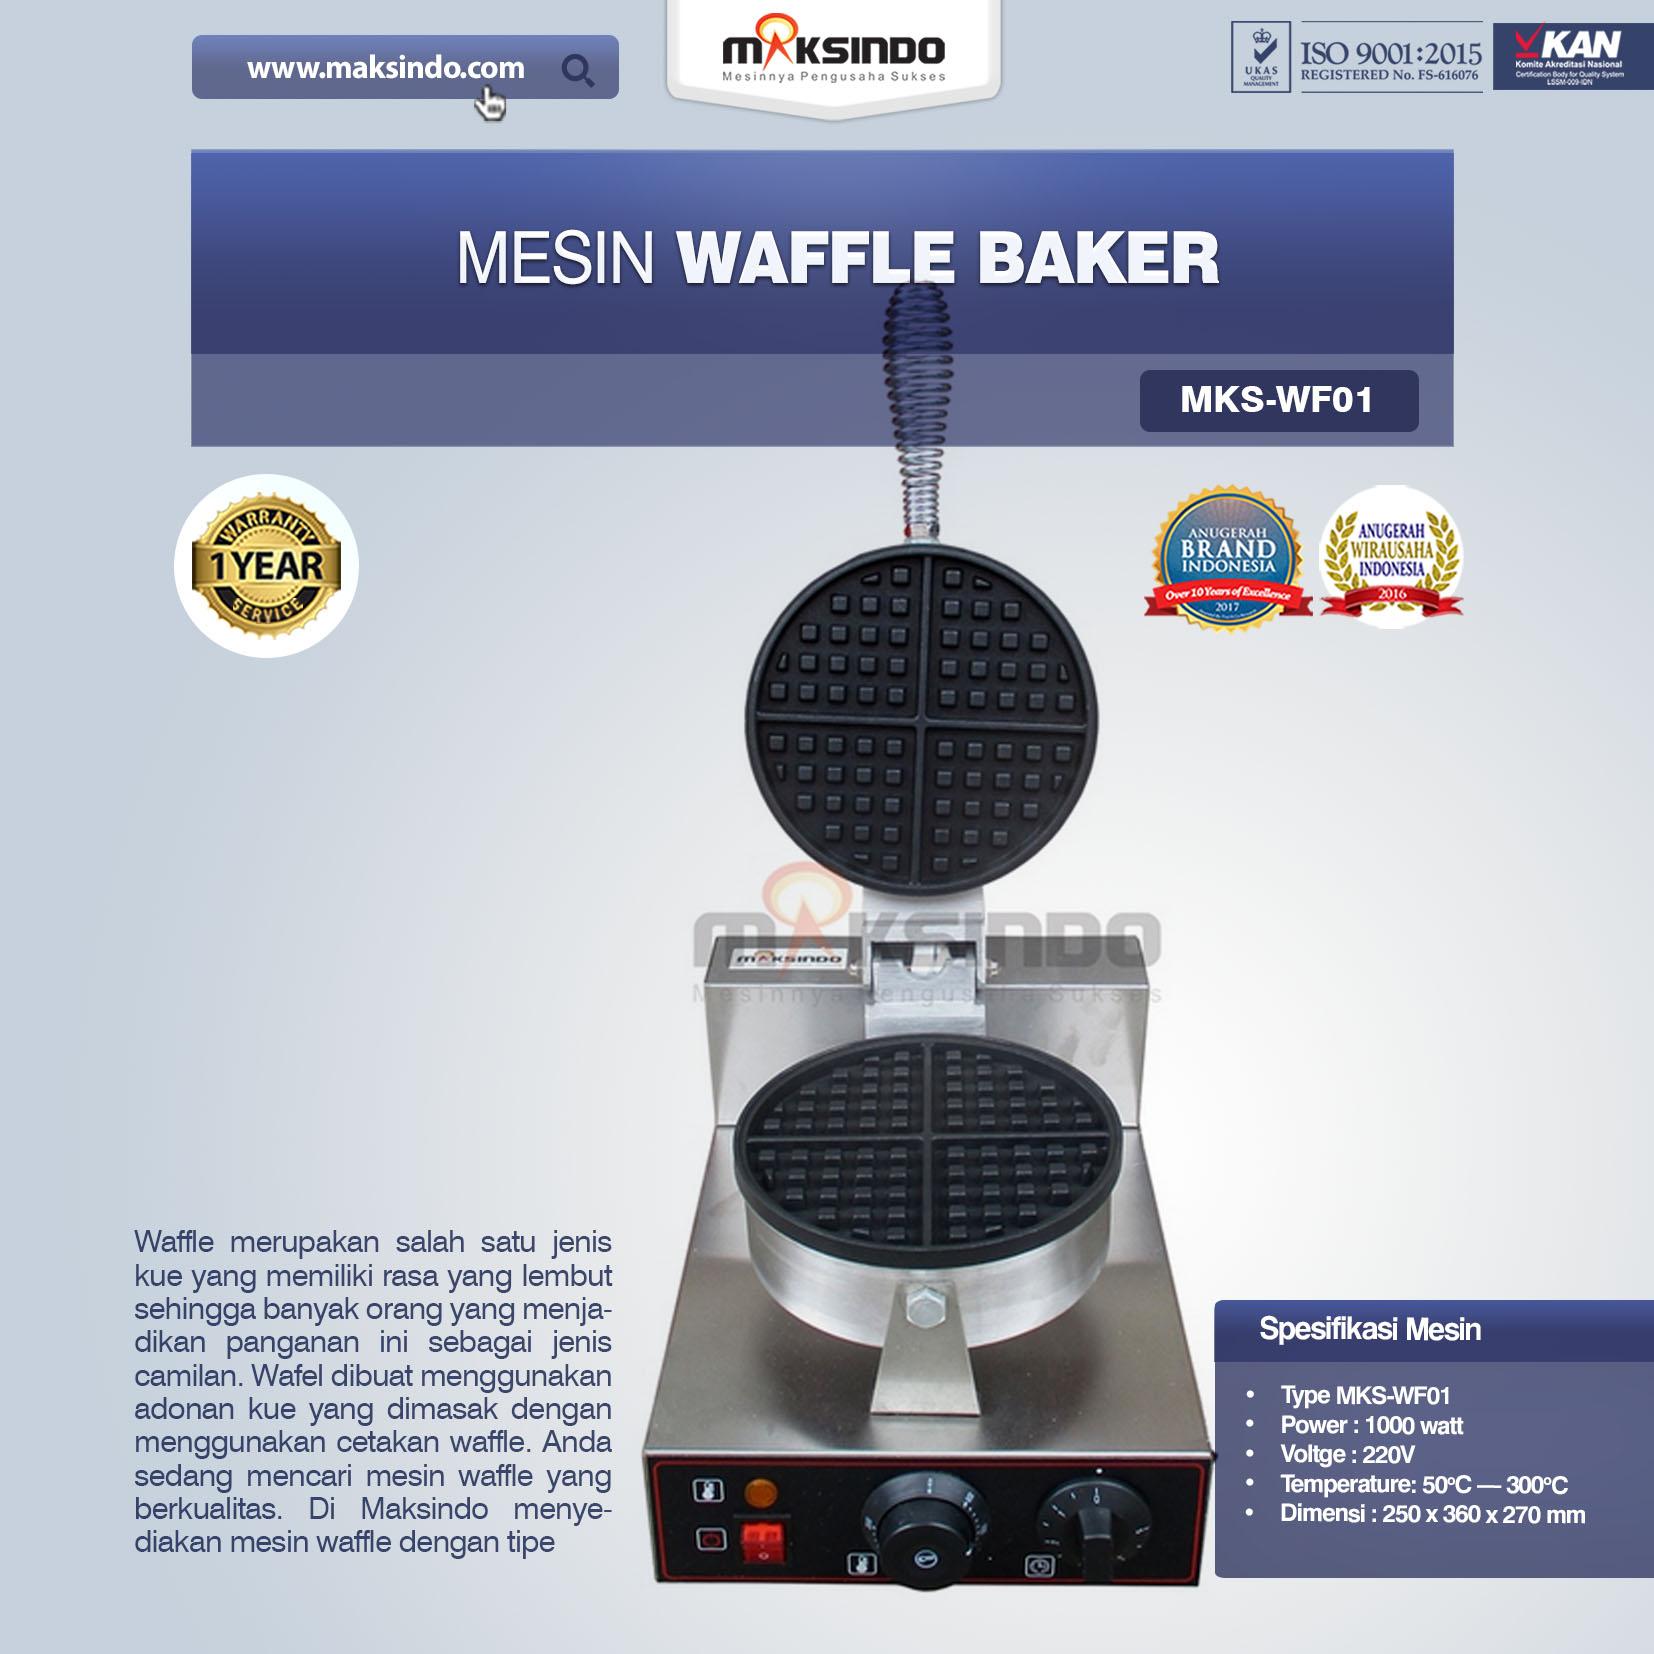 Jual Mesin Waffle Baker MKS-WF01 di Palembang